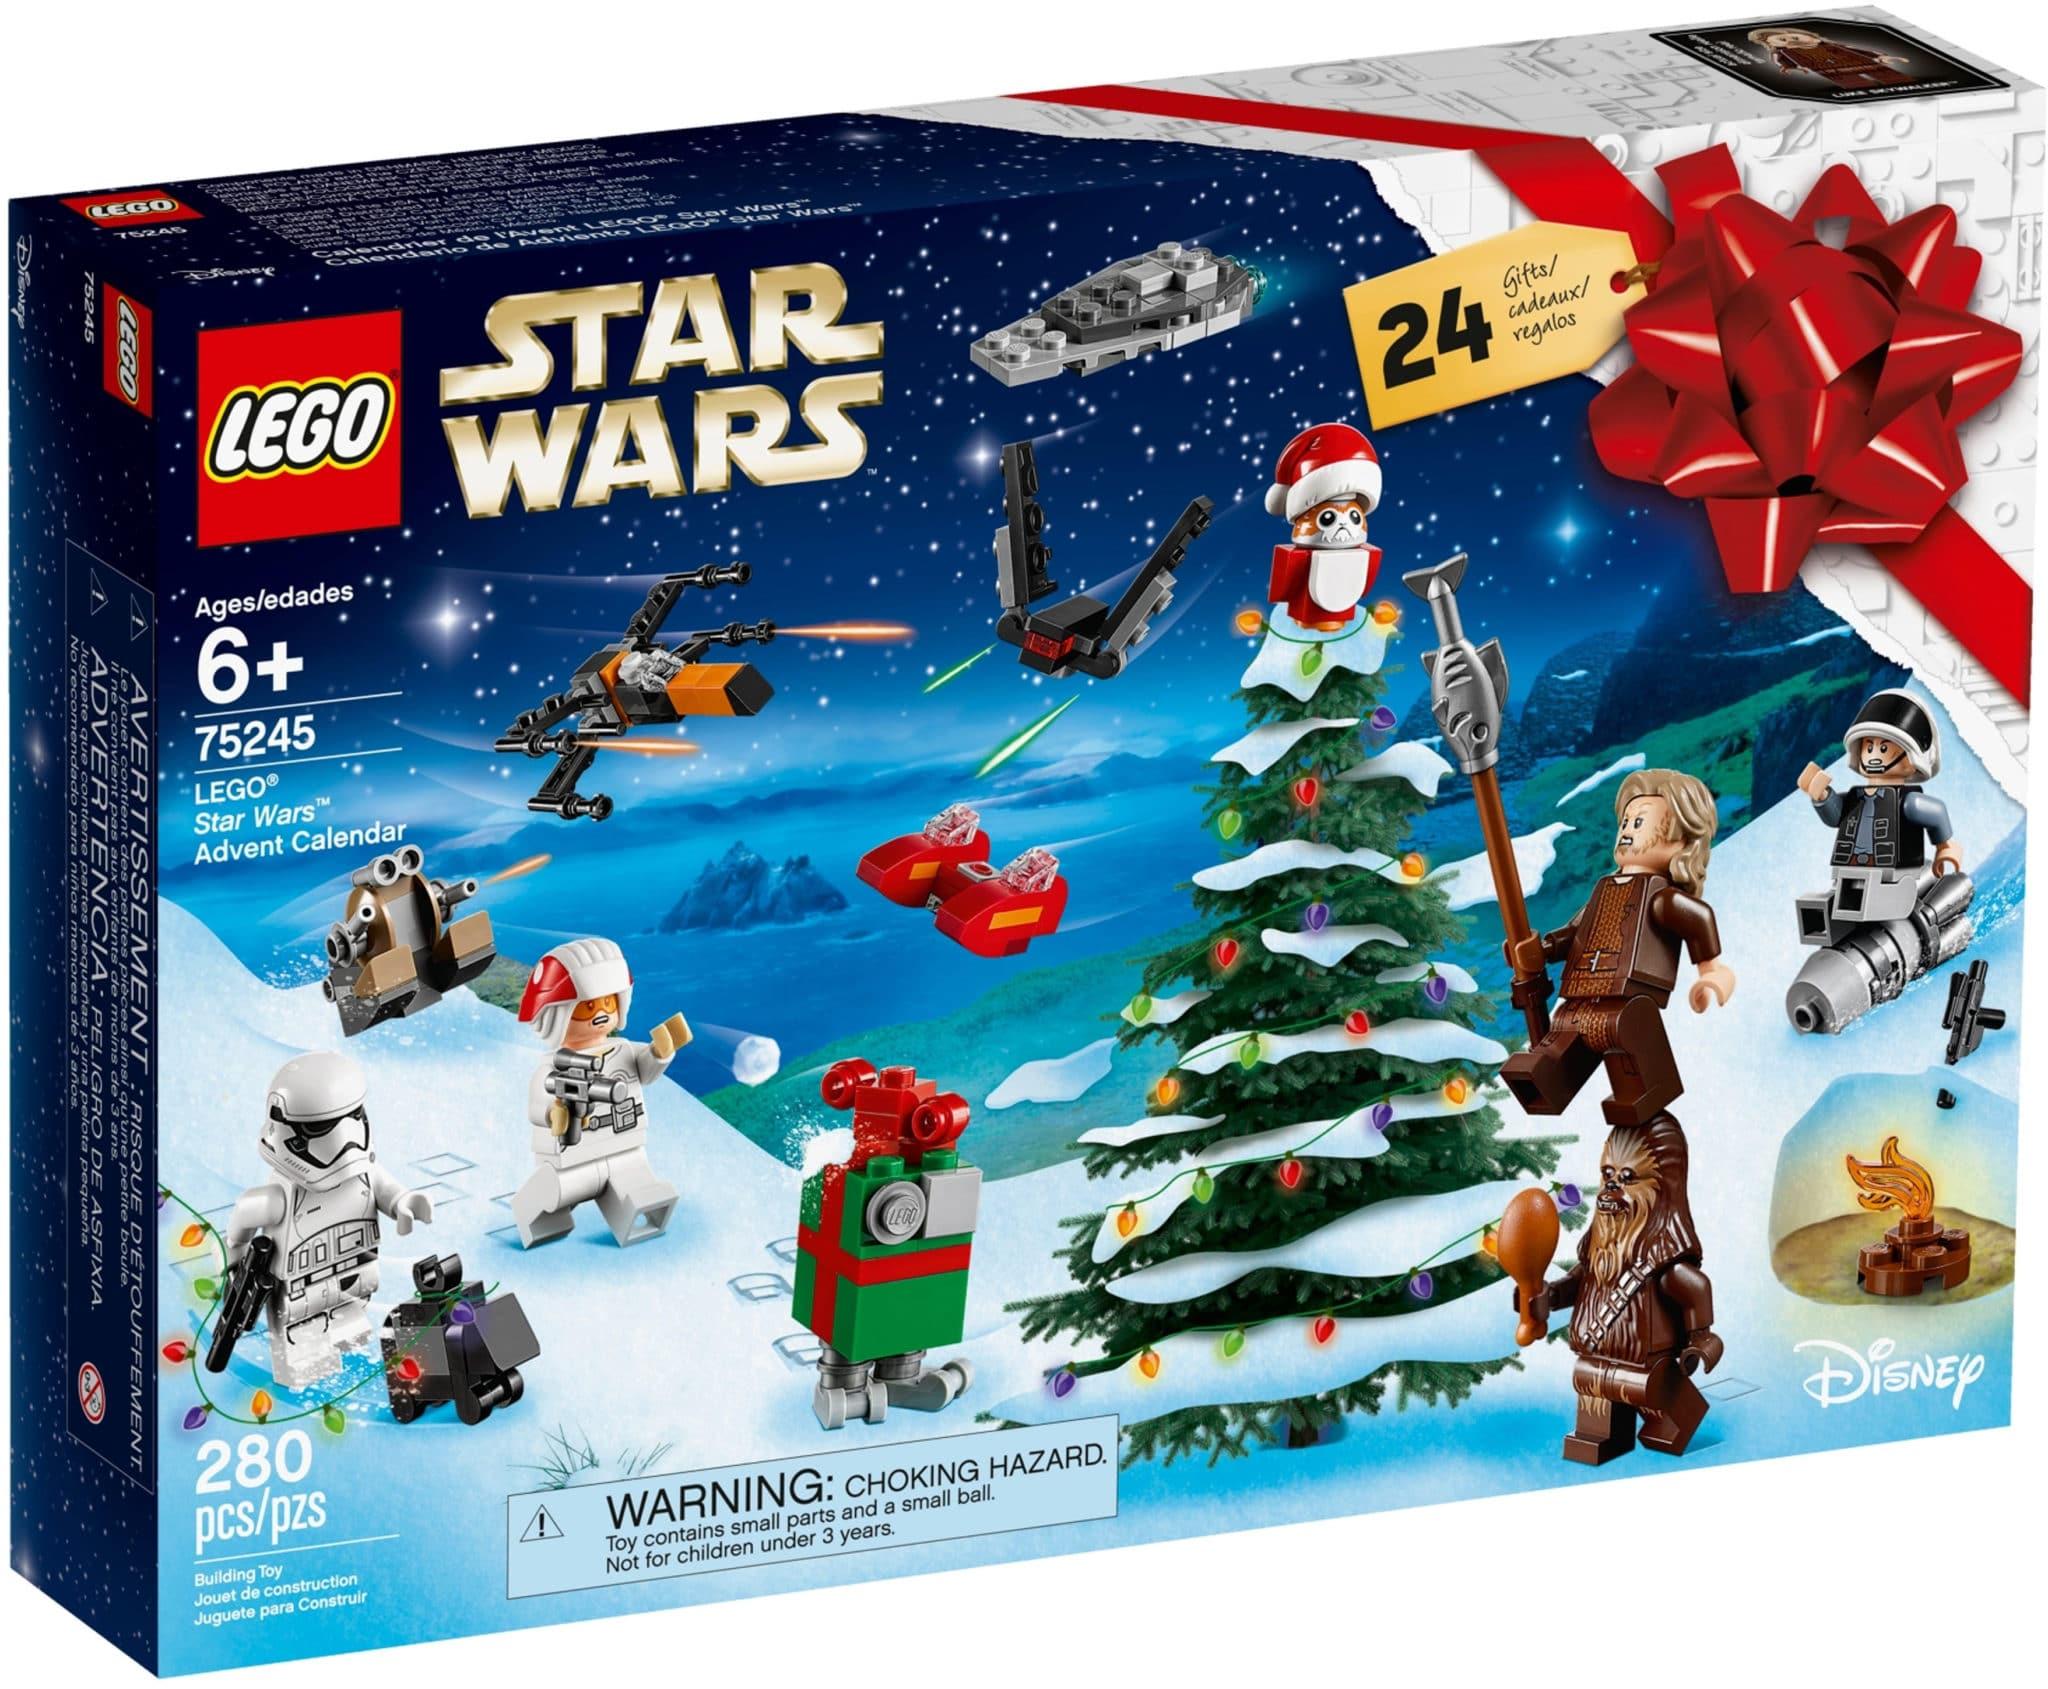 LEGO 75245 Star Wars Adventskalender 2019